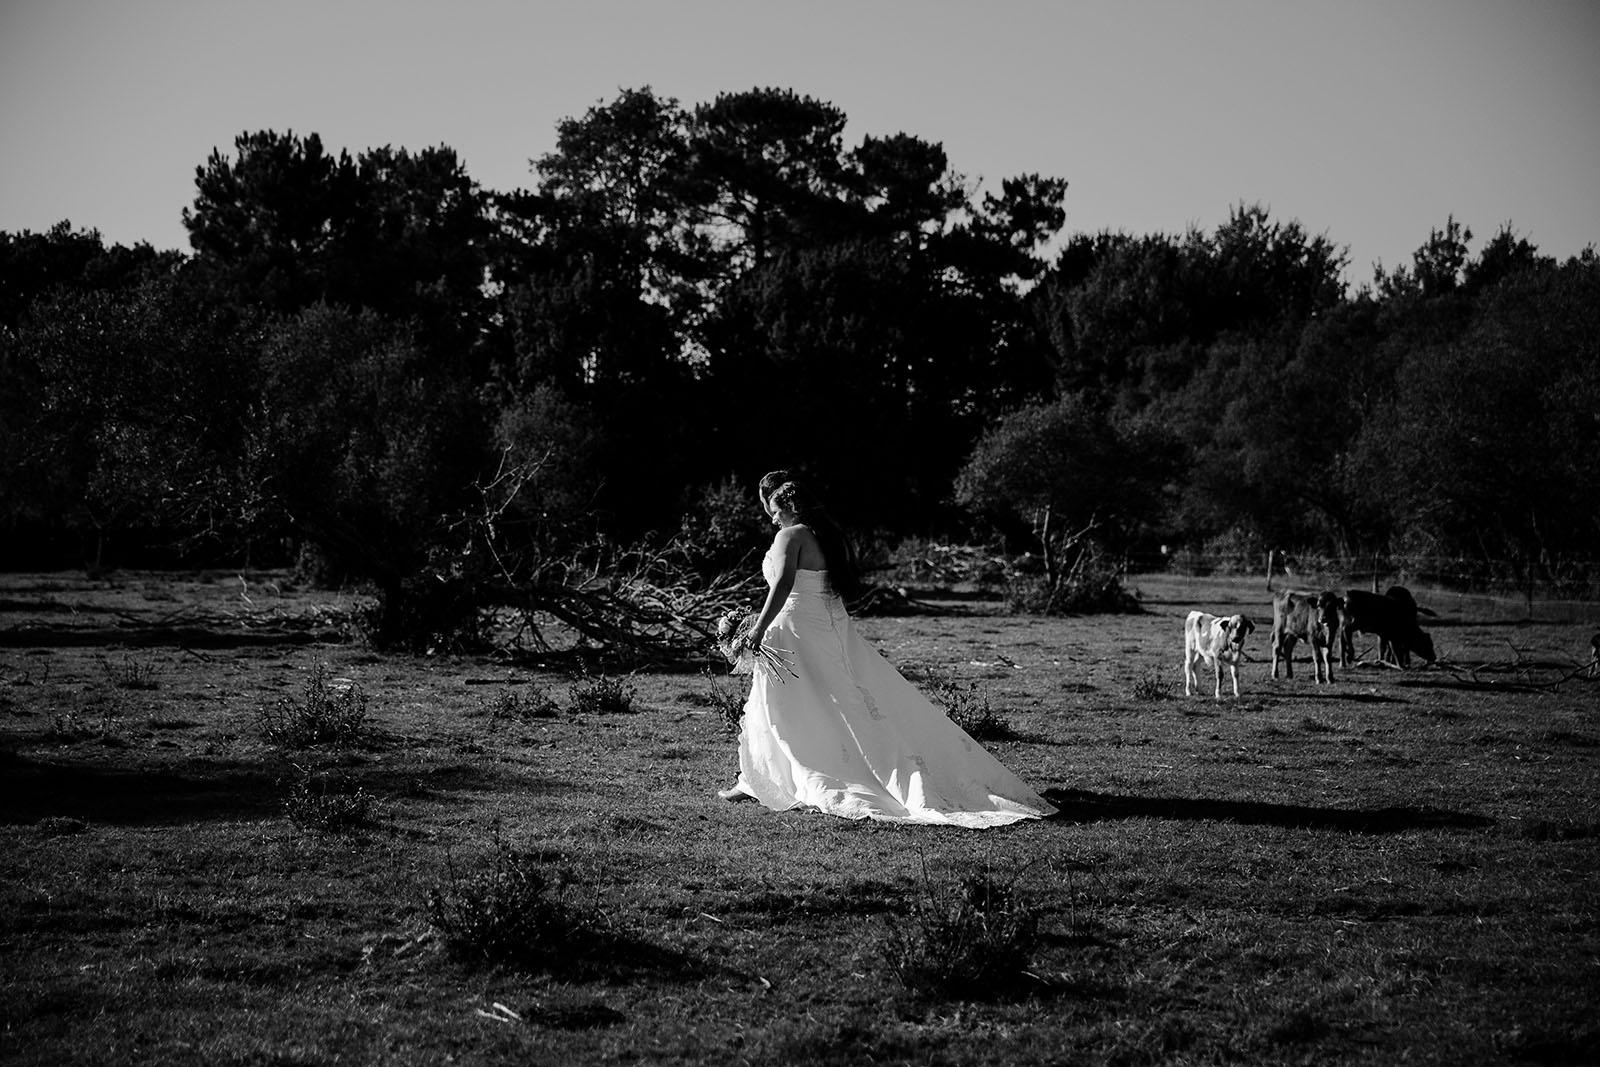 day-after-cheval-photographe-mariage-castille-alma-bordeaux-lacanau (14)